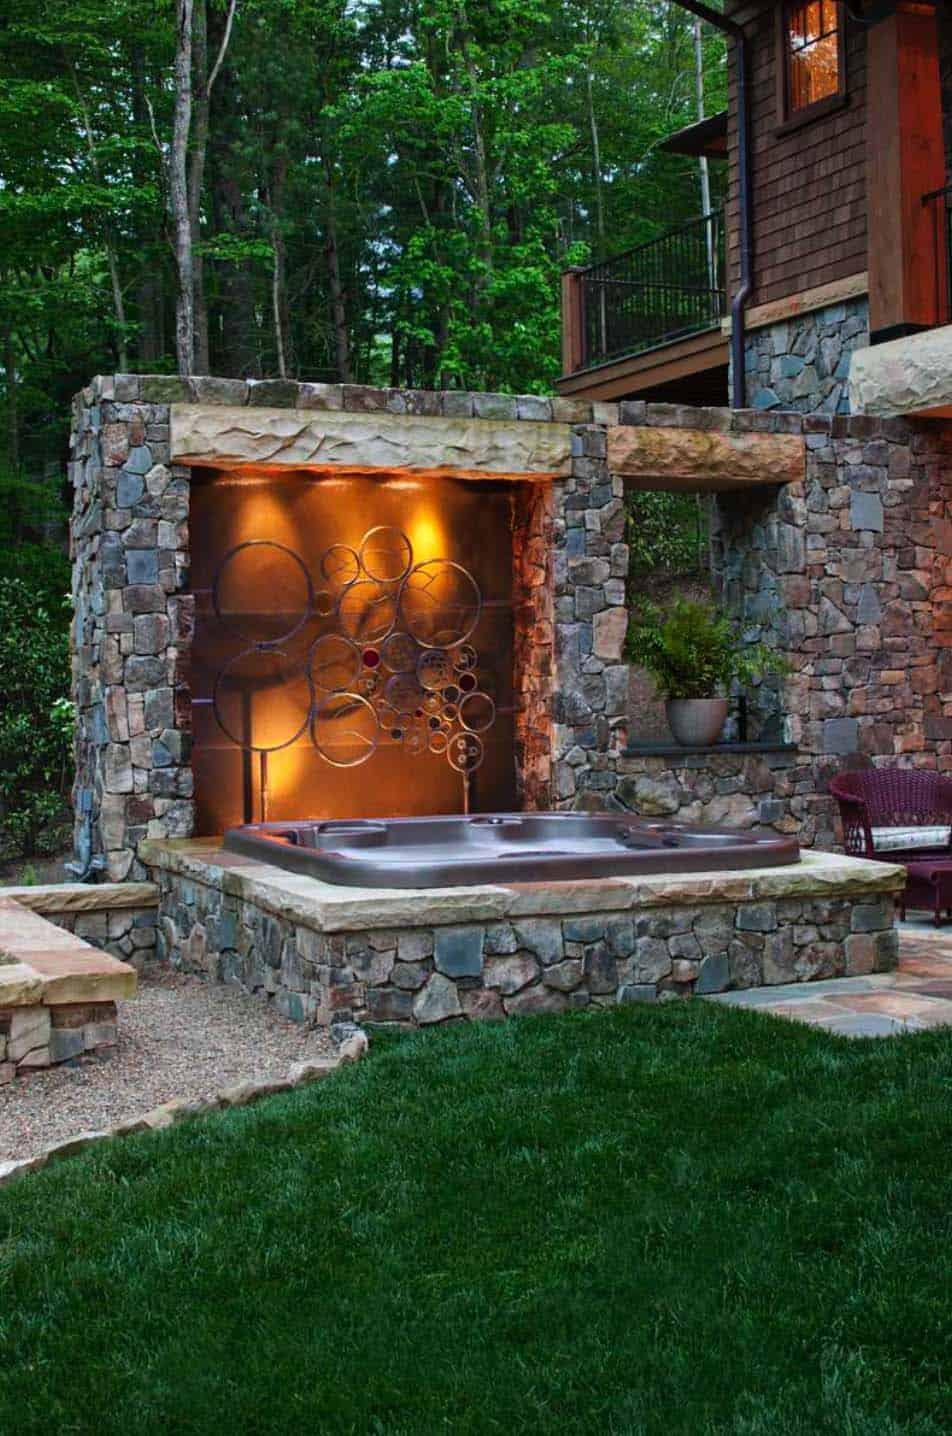 hot tub ideas to create a backyard oasis